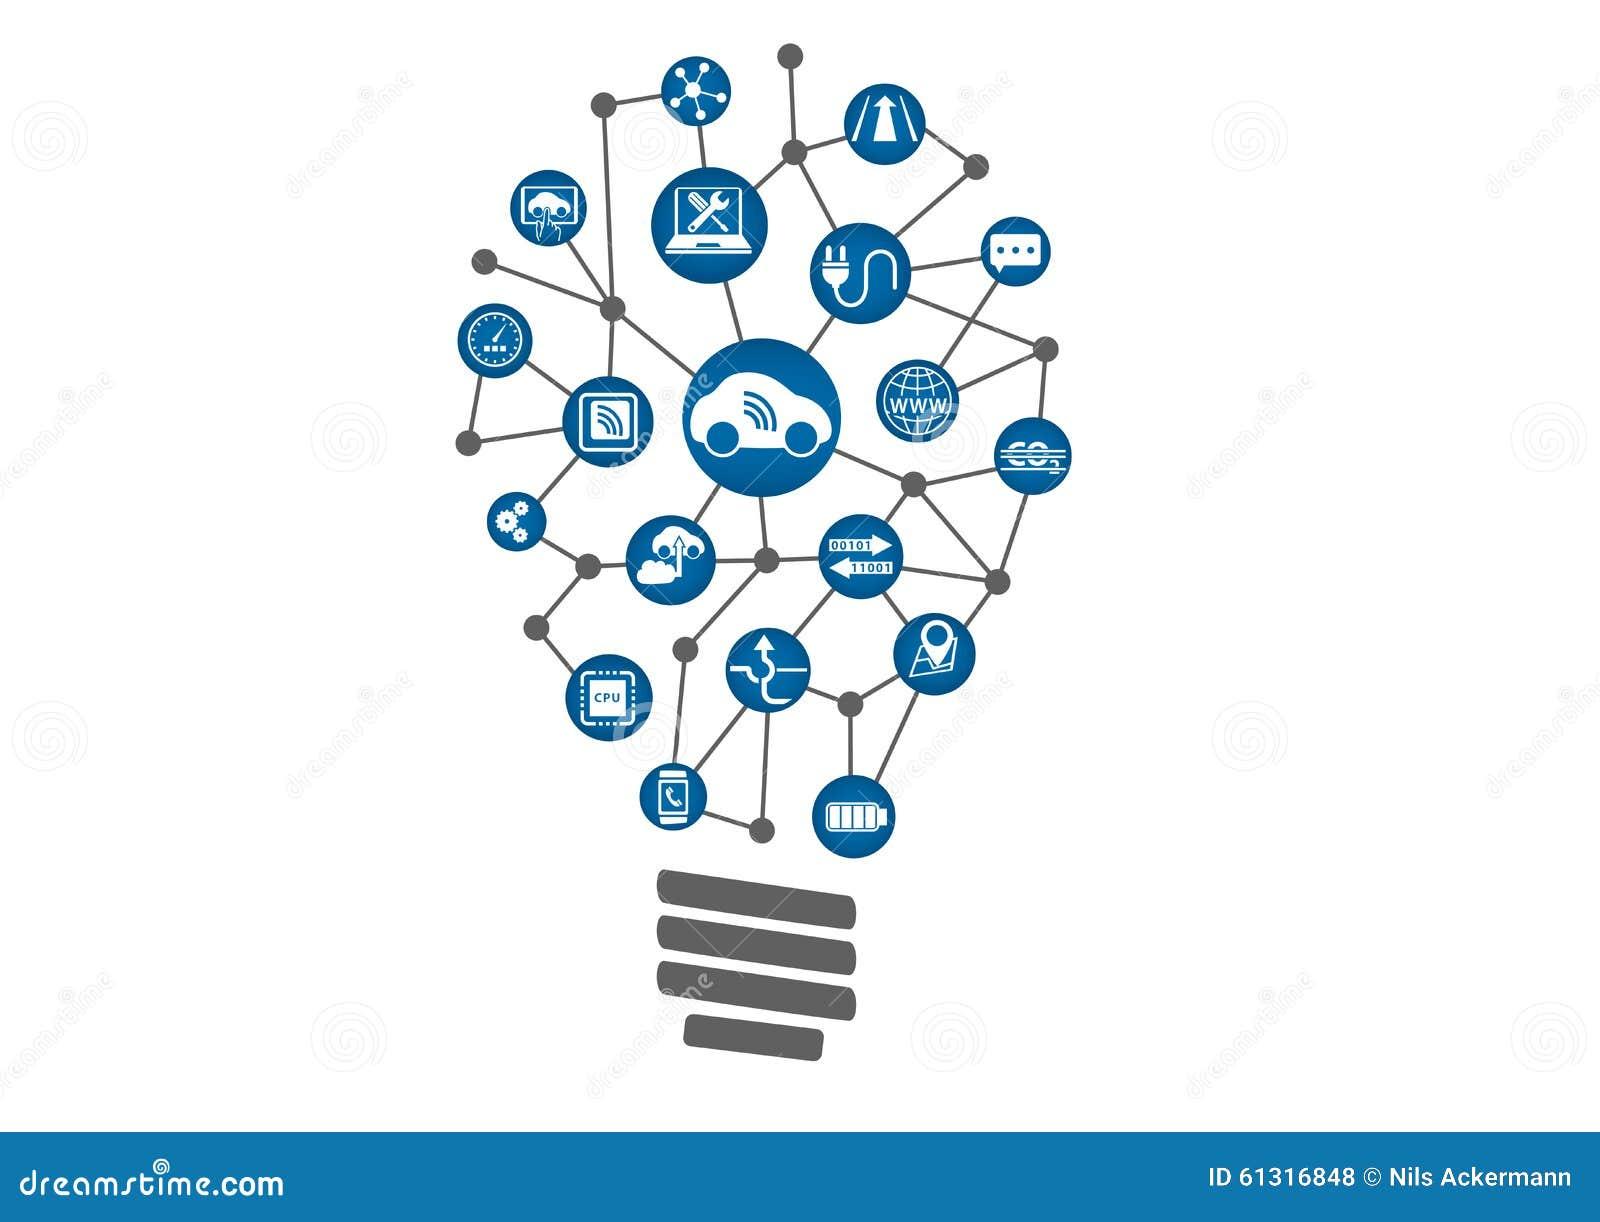 Connected Car Concept As Technology Innovation Light Bulb